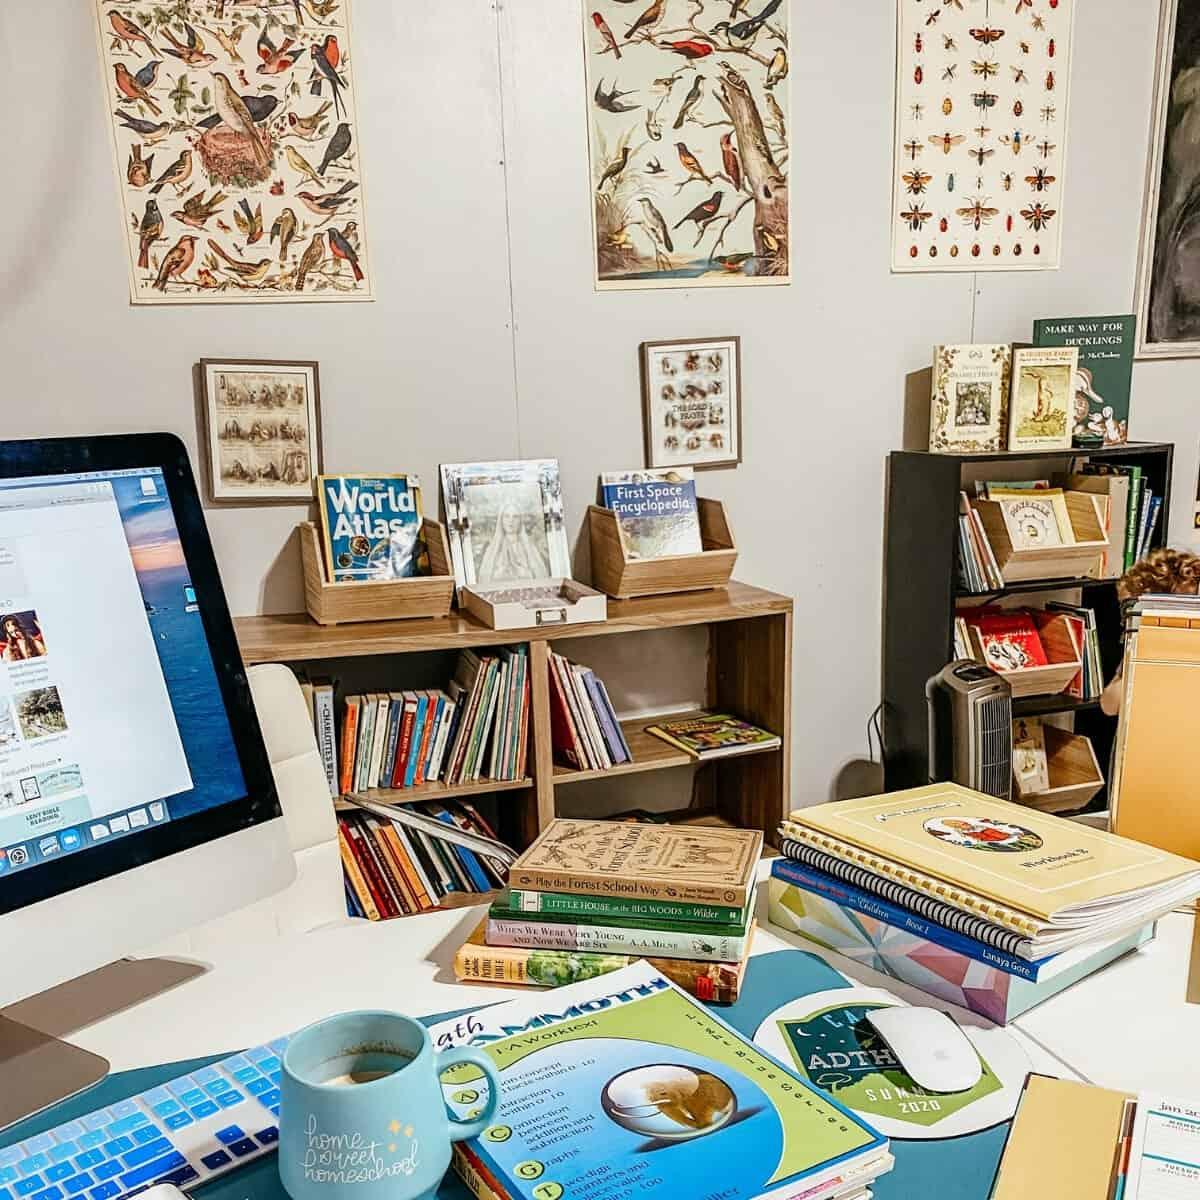 school desk piled with homeschool books and teacher planner